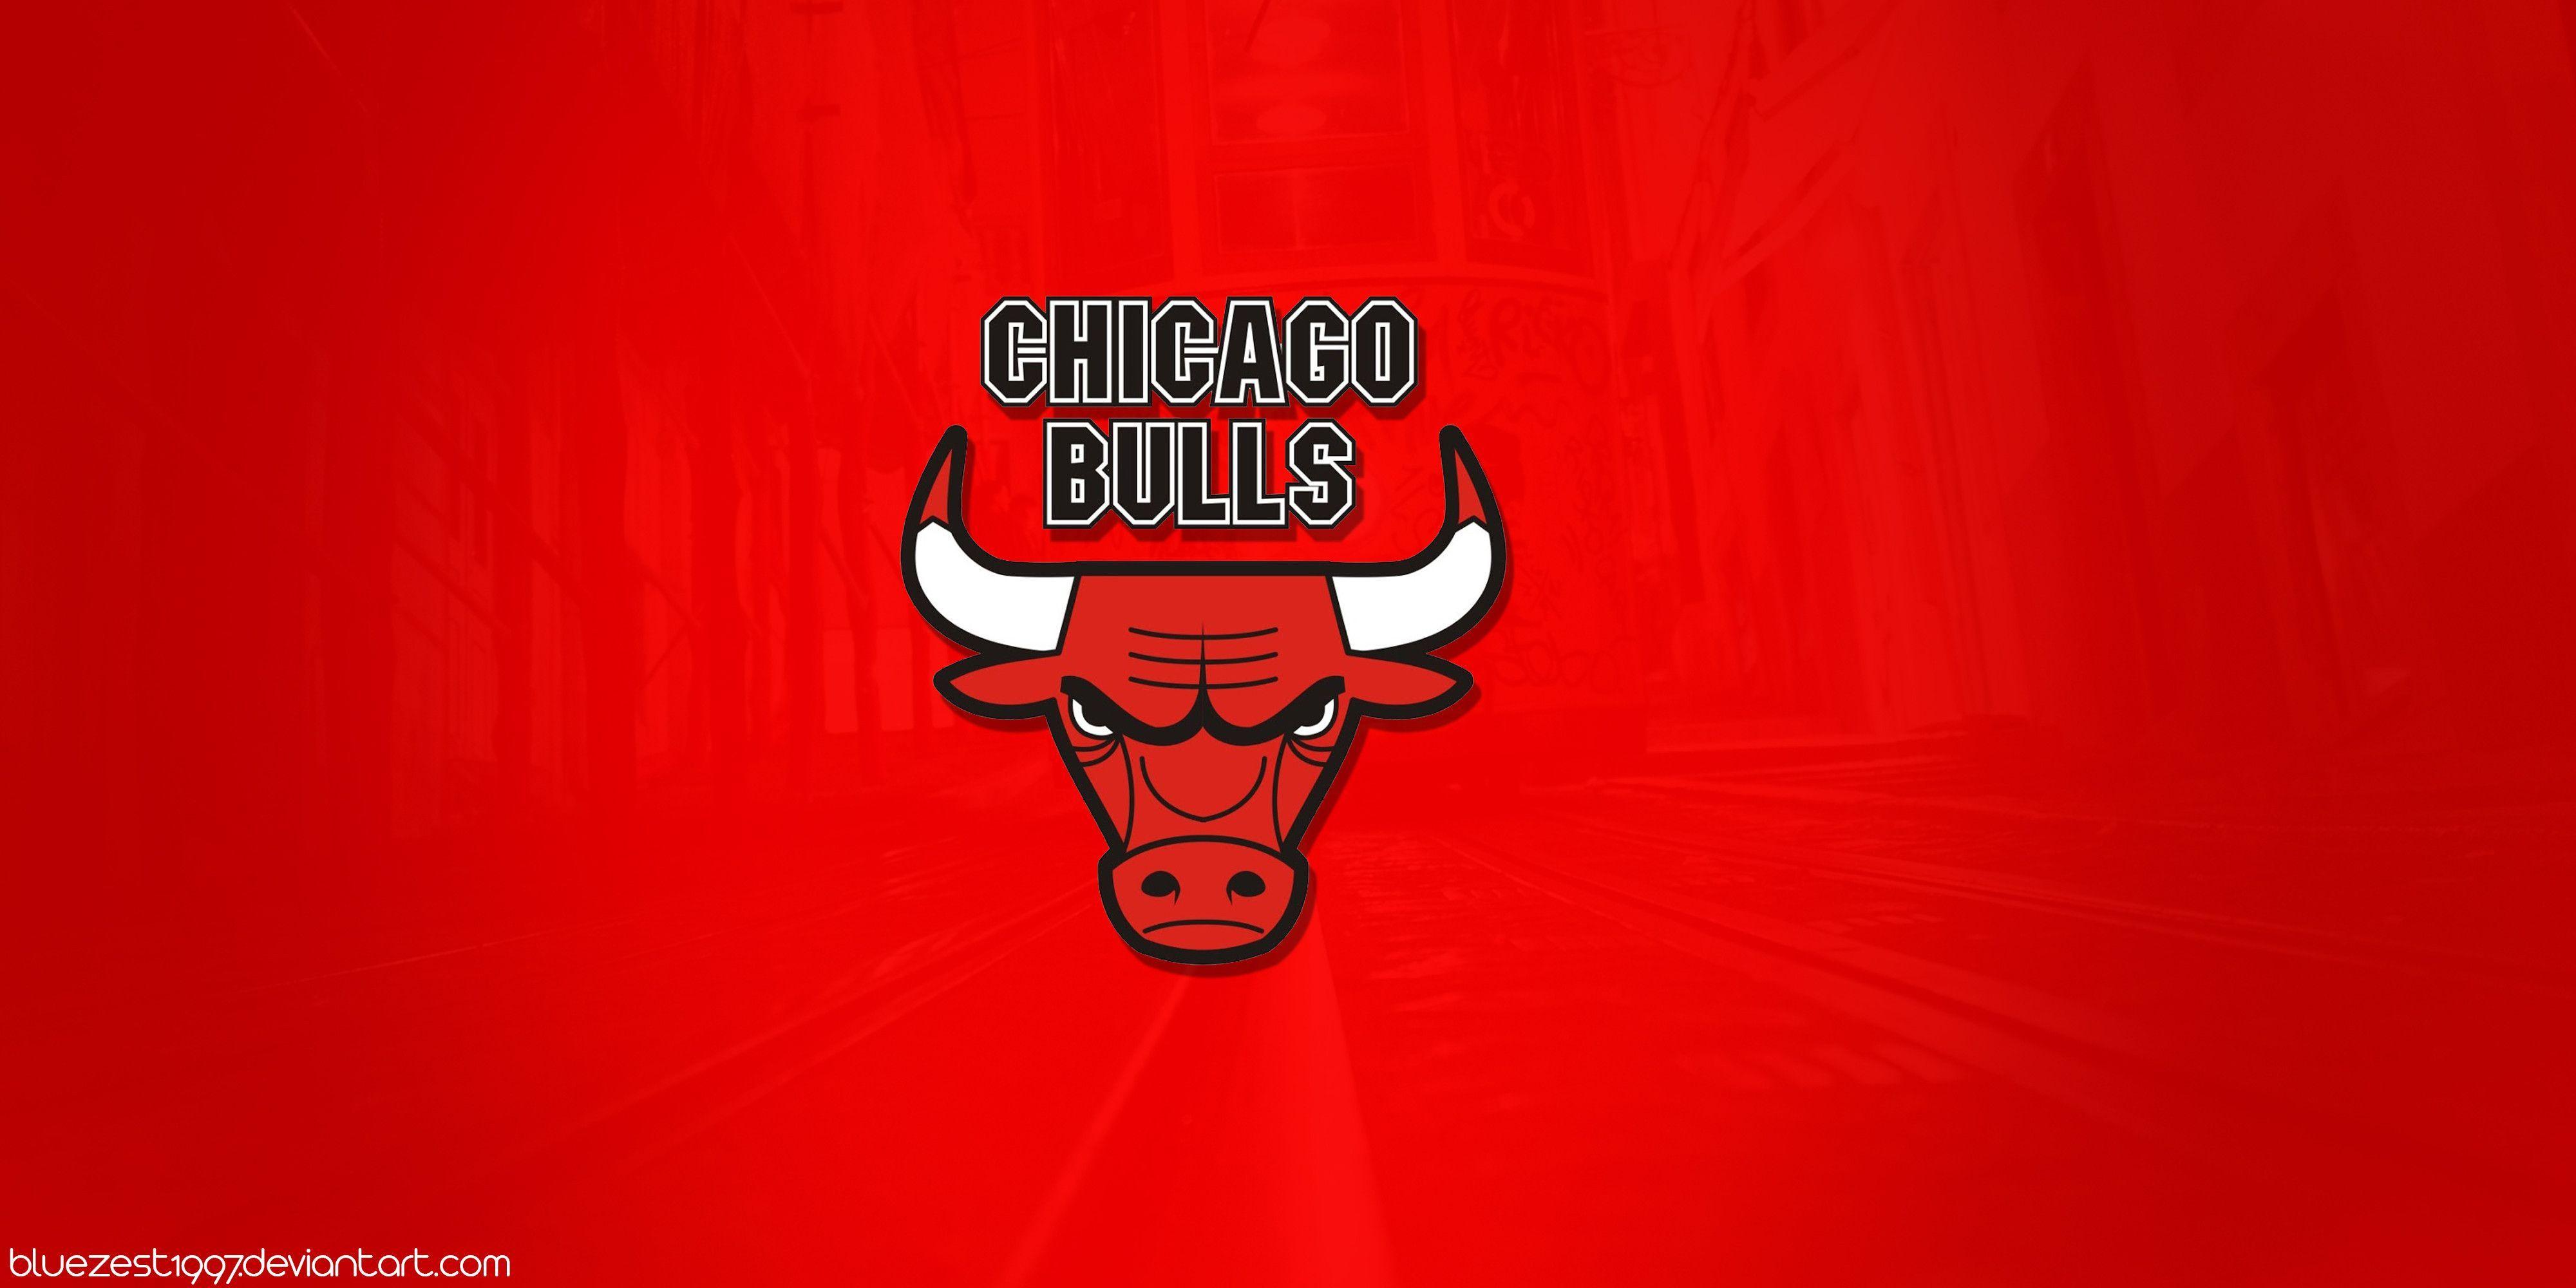 Chicago Bulls Wallpaper Hd Resolution Wxh Chicago Bulls Wallpaper Bulls Wallpaper Chicago Bulls